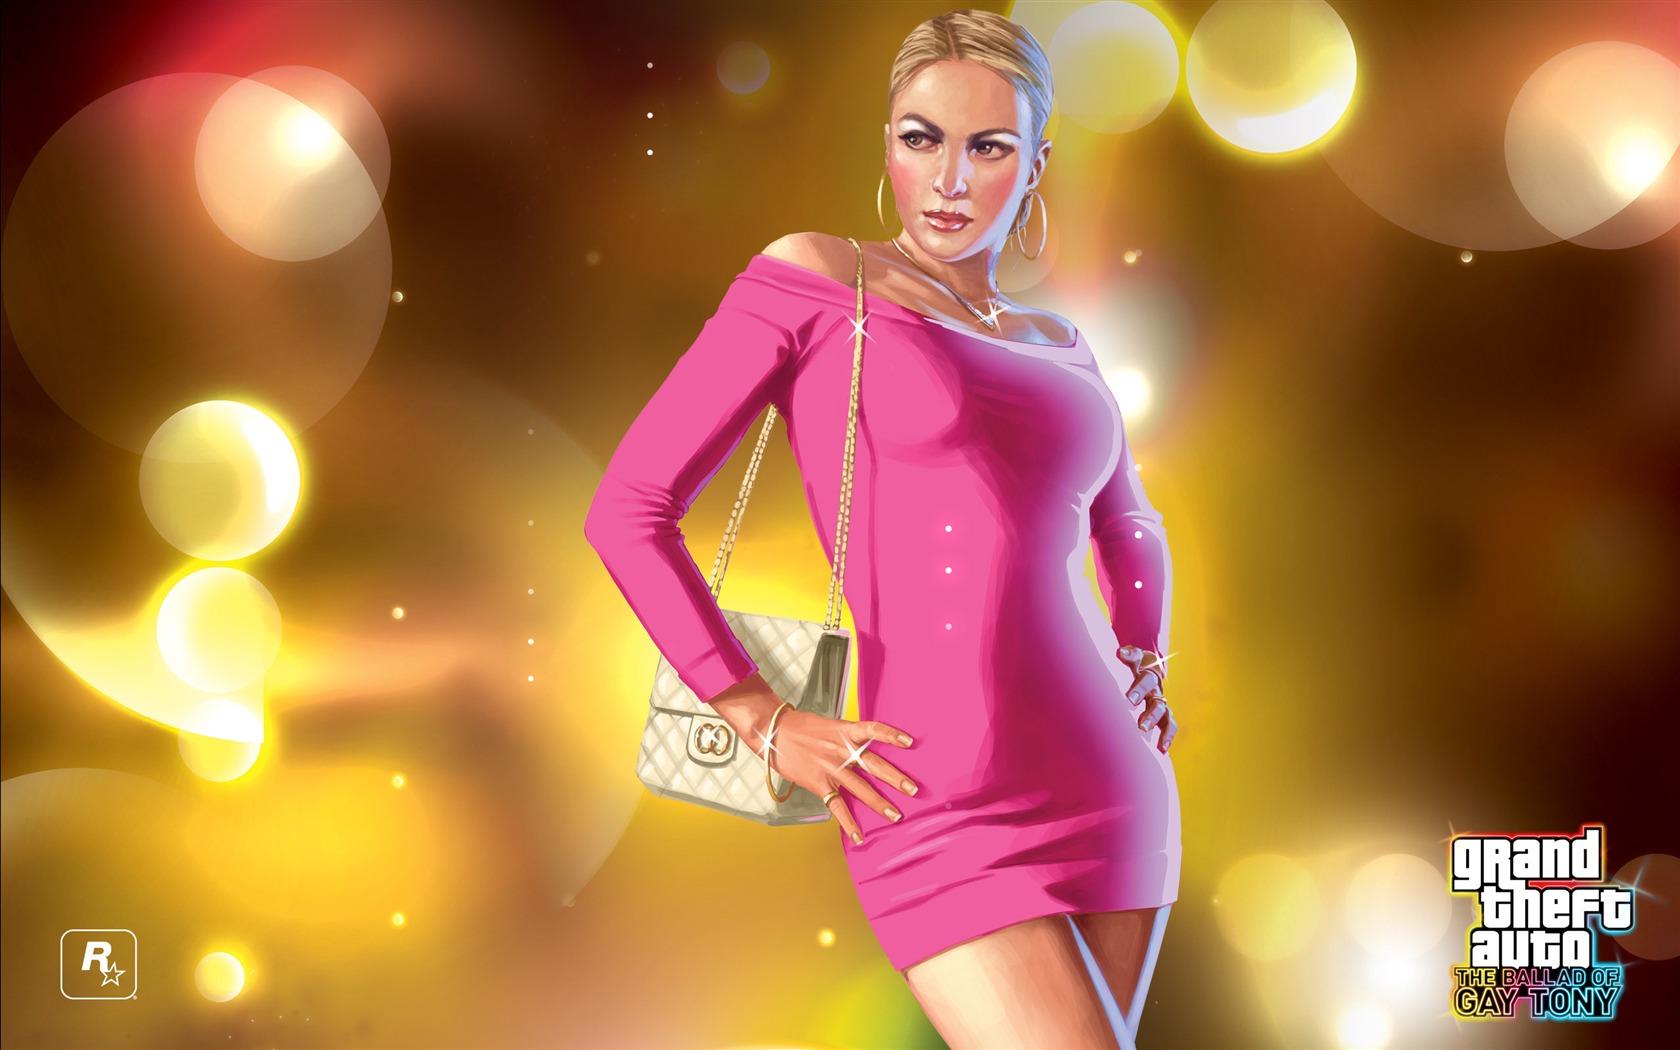 Арт к игре Grand Theft Auto: The Ballad of Gay Tony